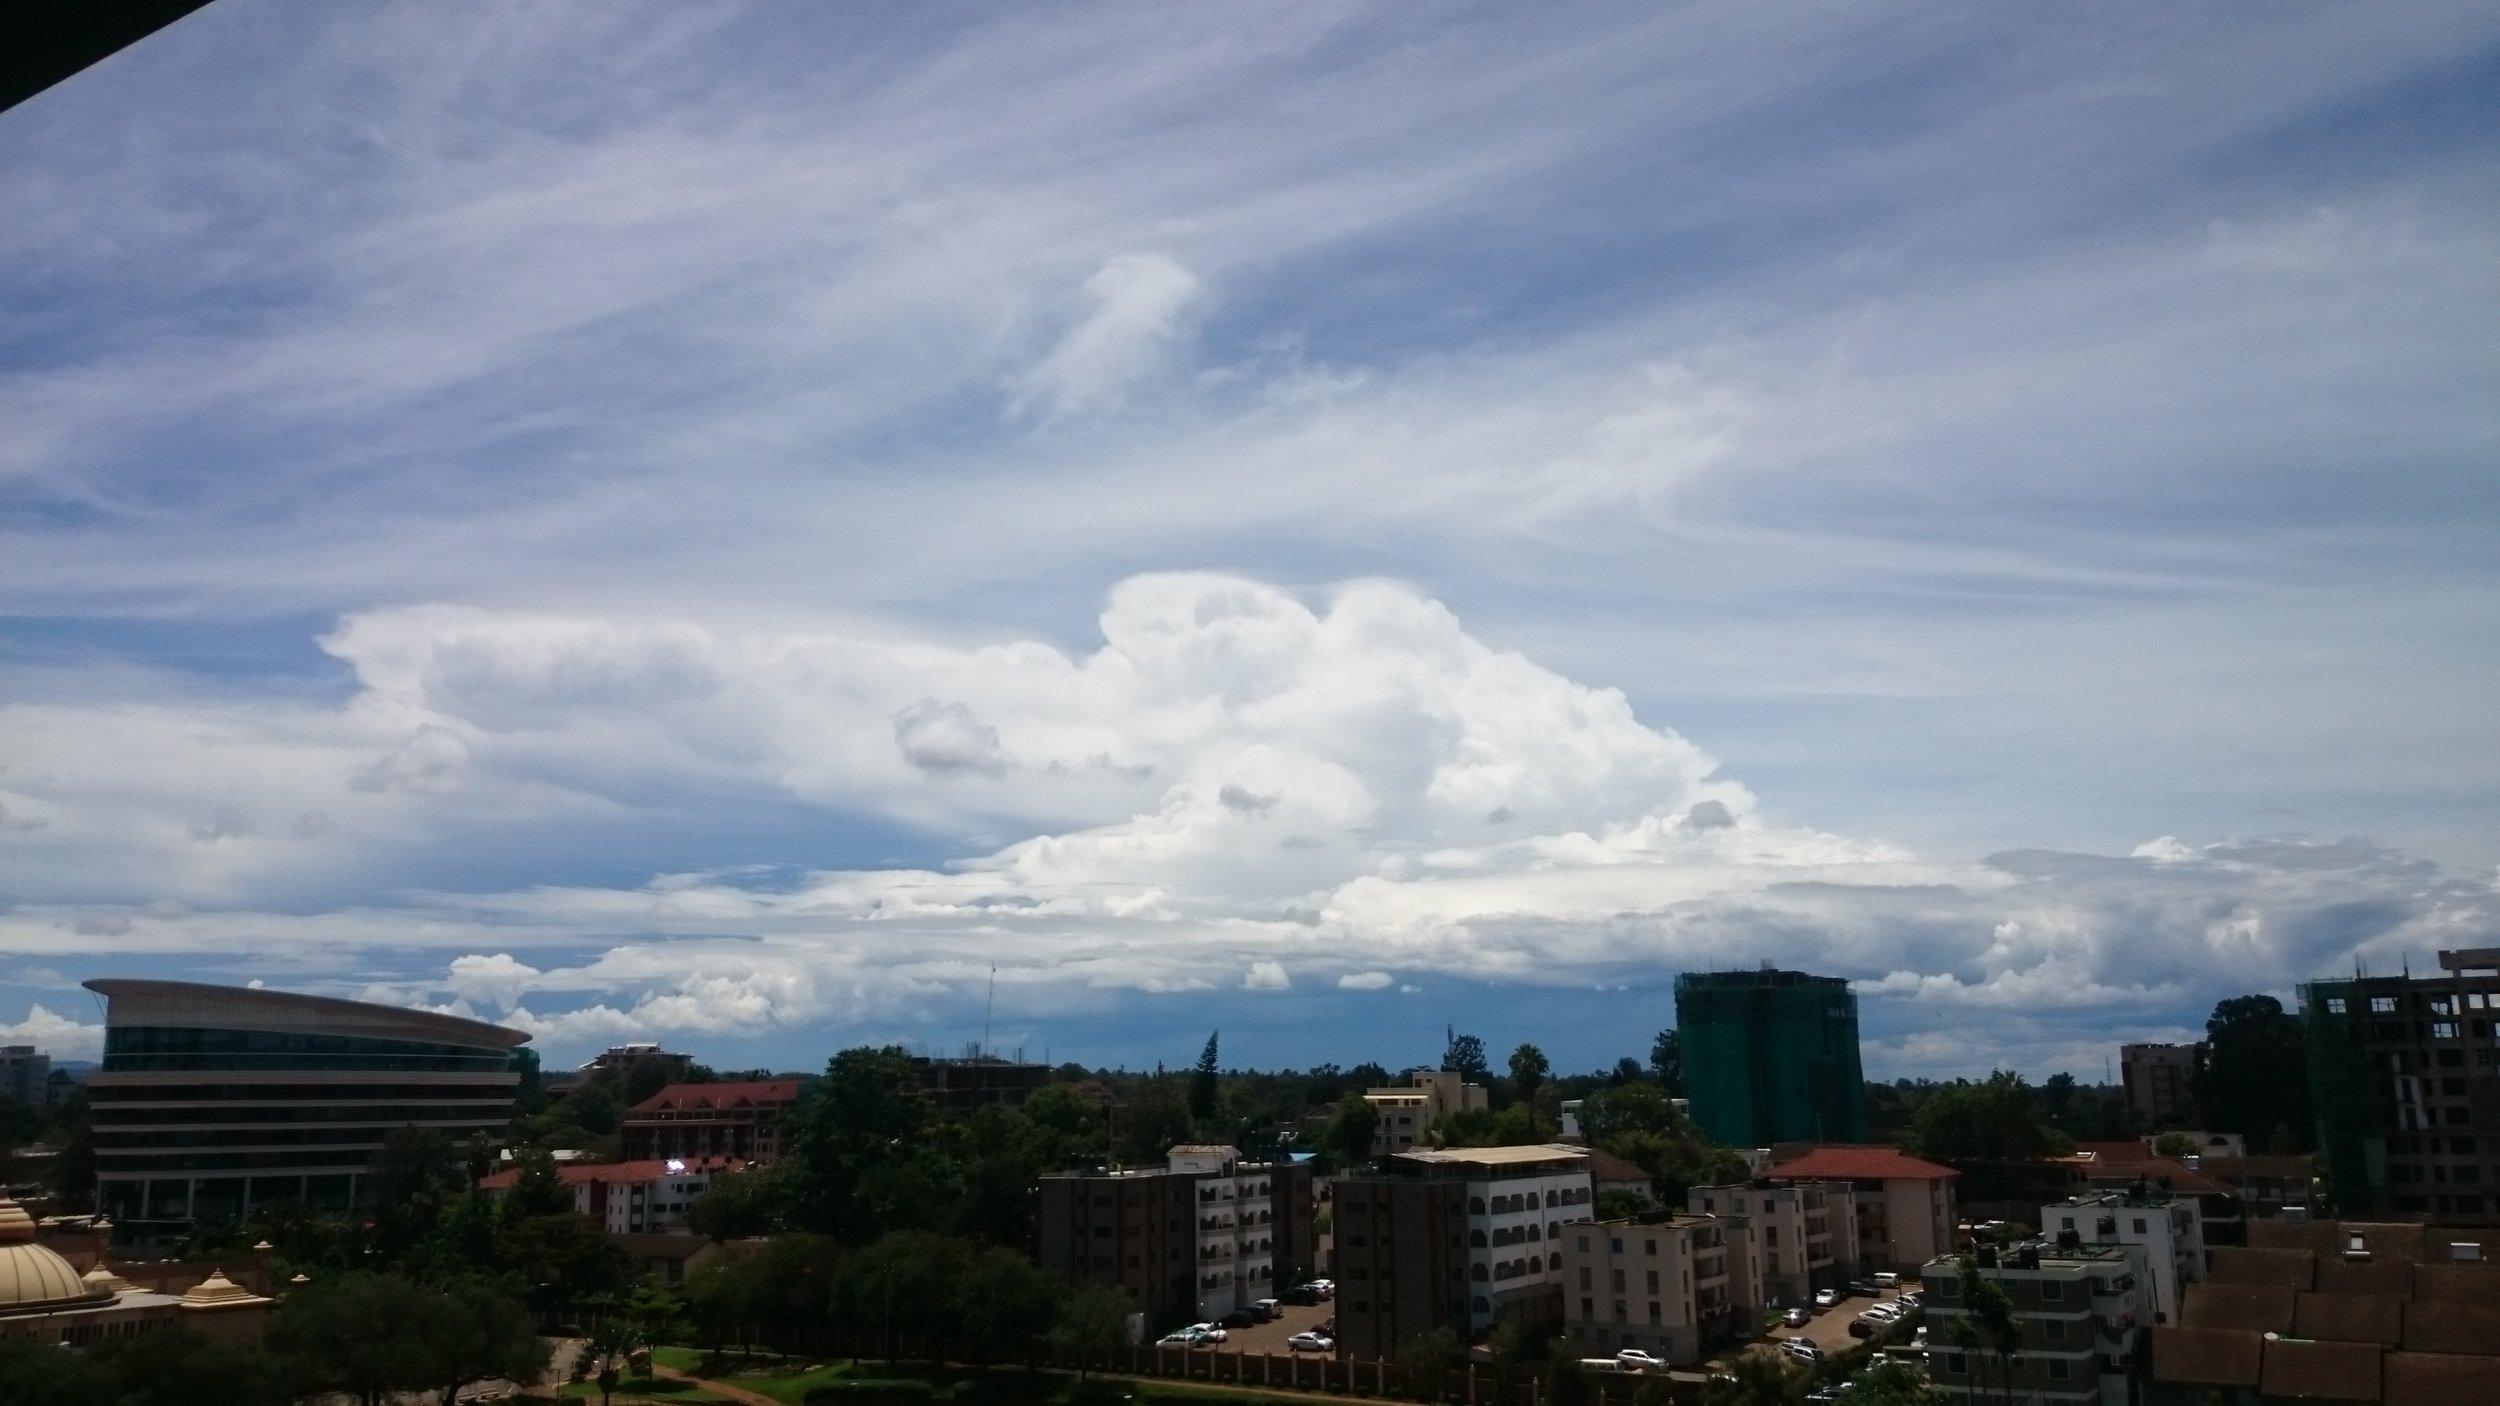 Rain clouds as seen from Westlands, Nairobi